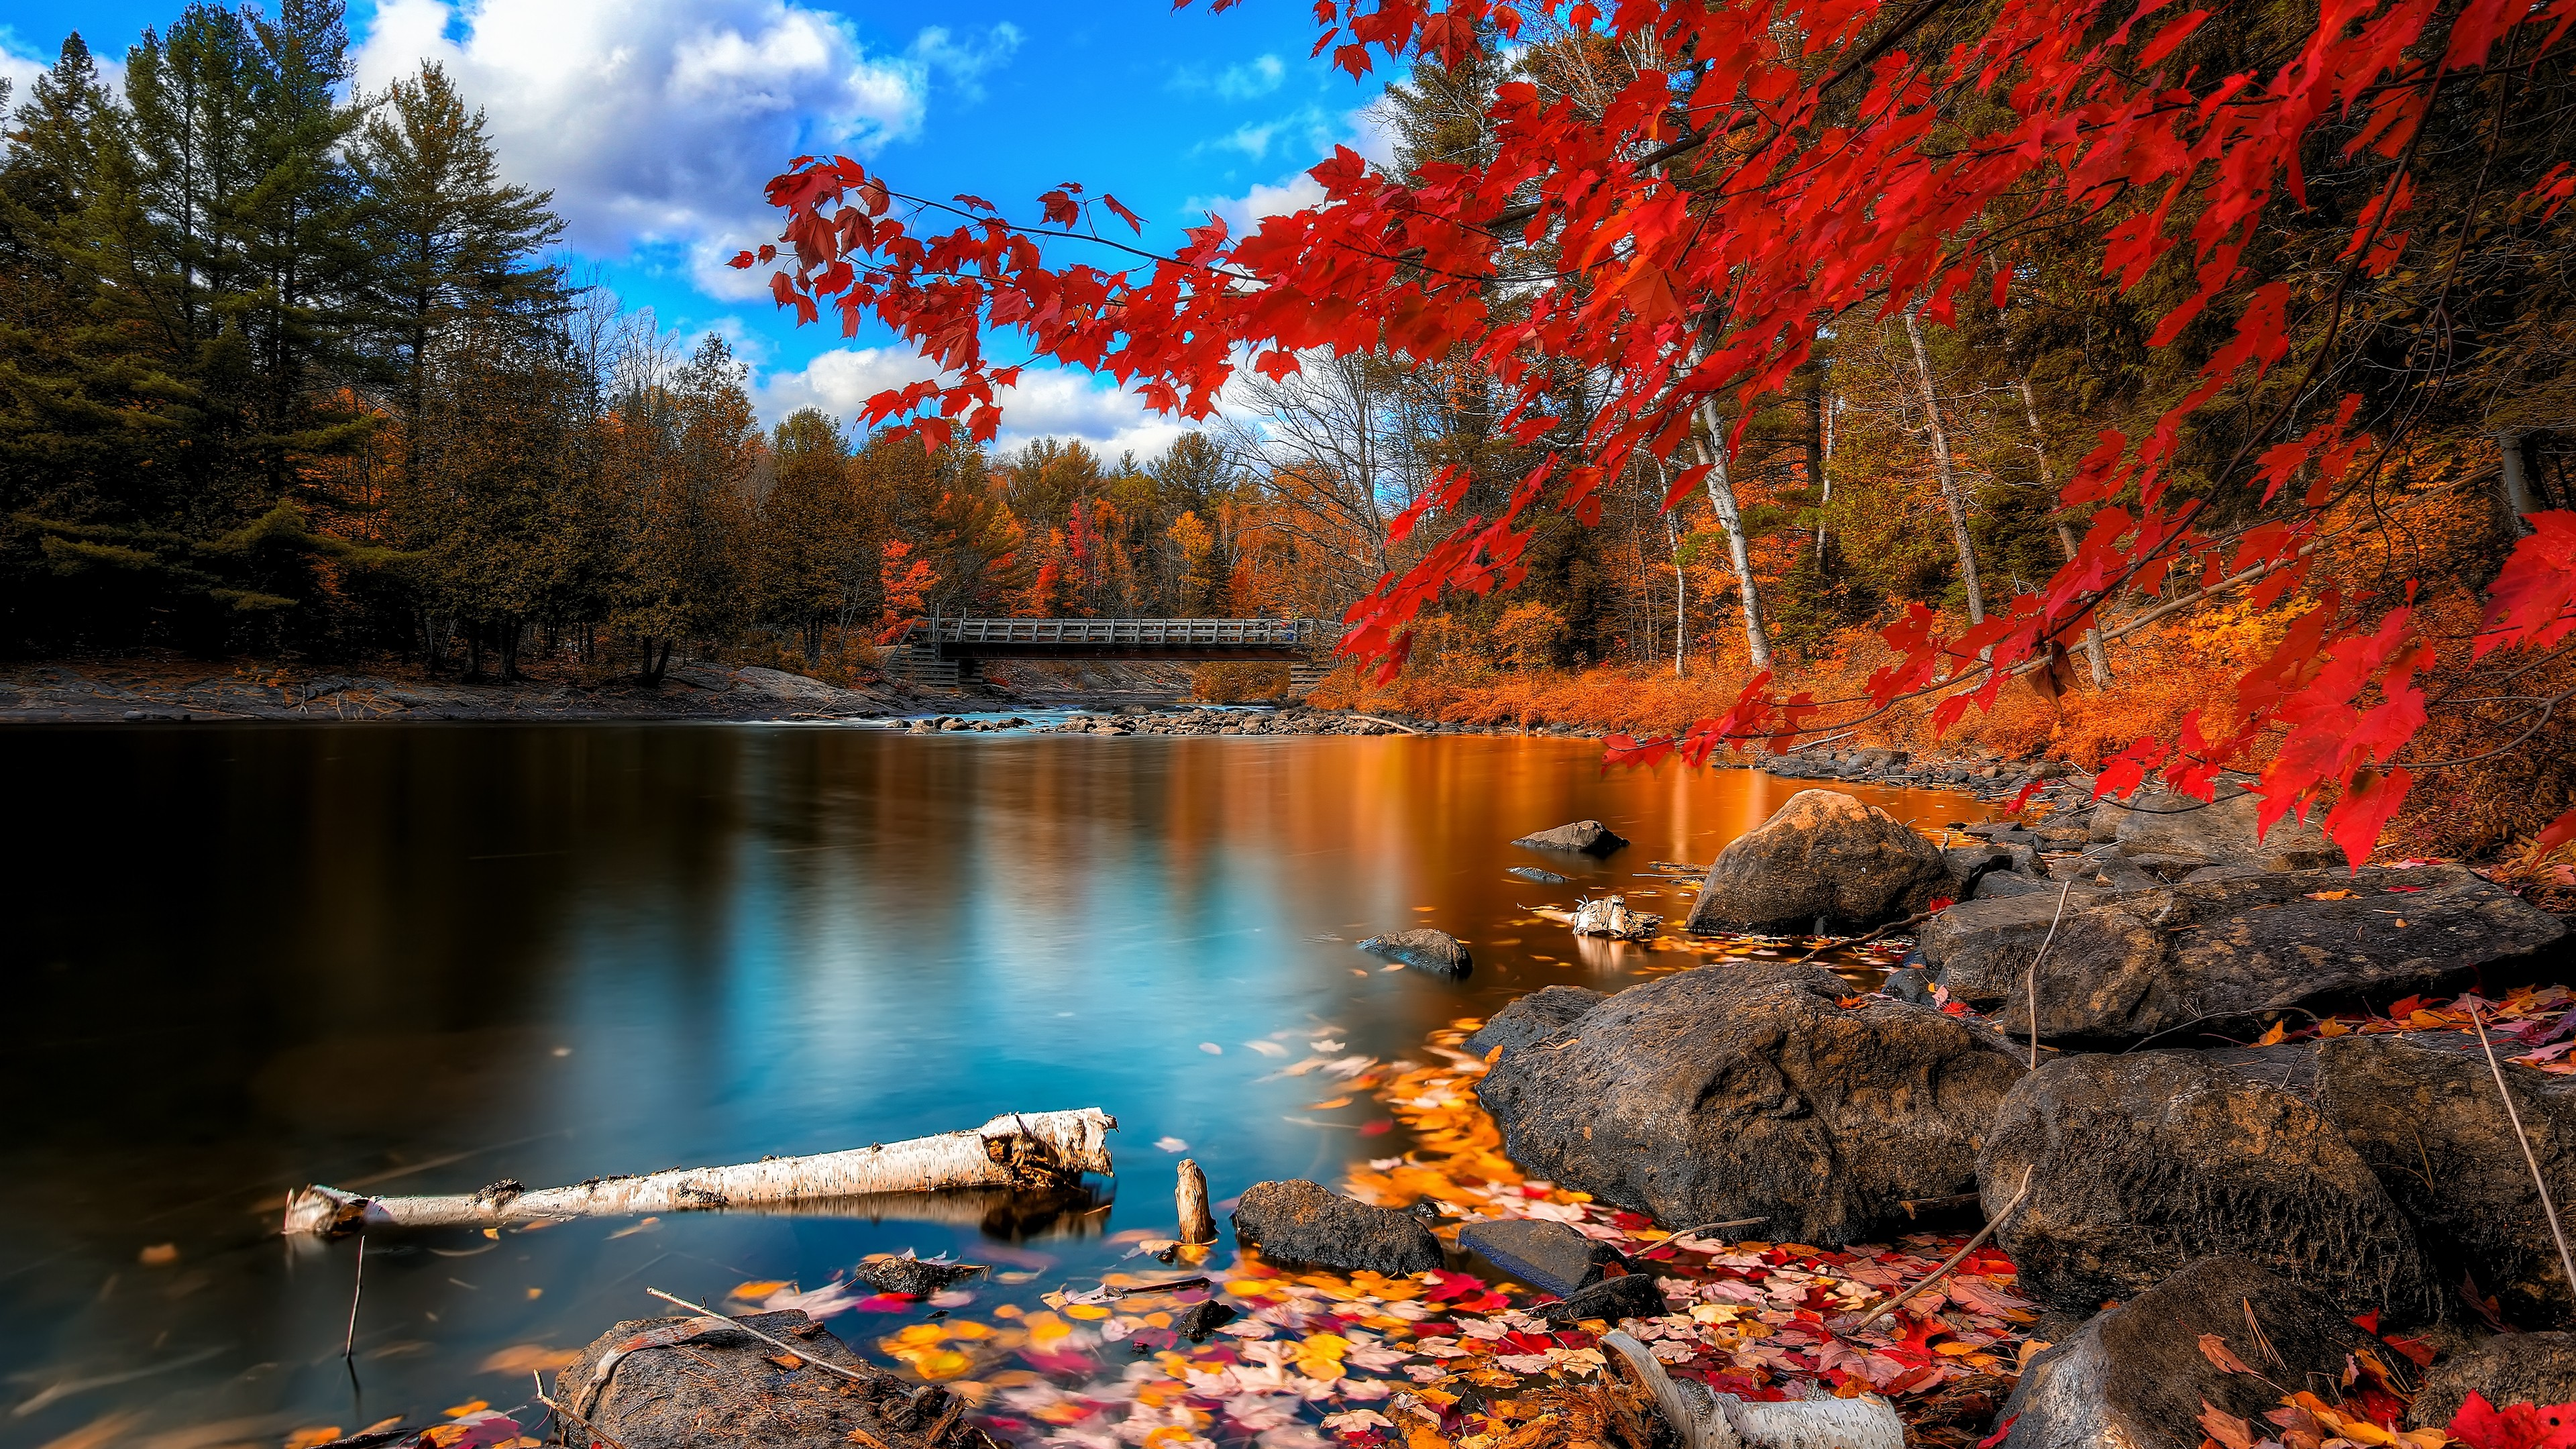 Wallpaper Autumn Forest 4k Hd Wallpaper Leaves Trees Lake Rocks Beach Bridge Sky Clouds Nature 578